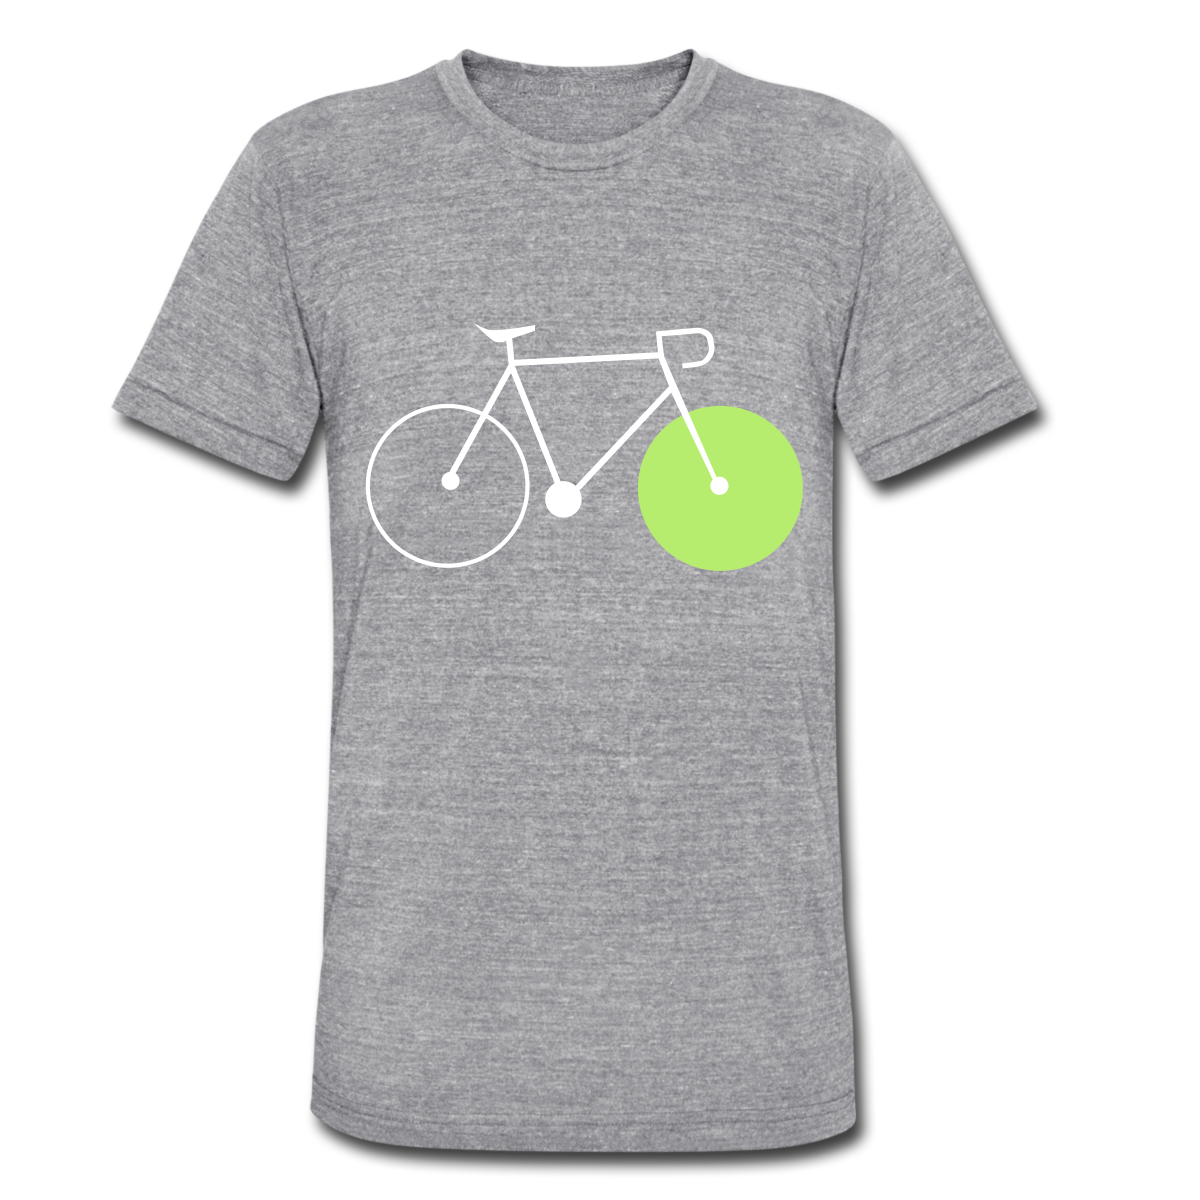 Shirt design inspiration - T Shirt Design Inspiration